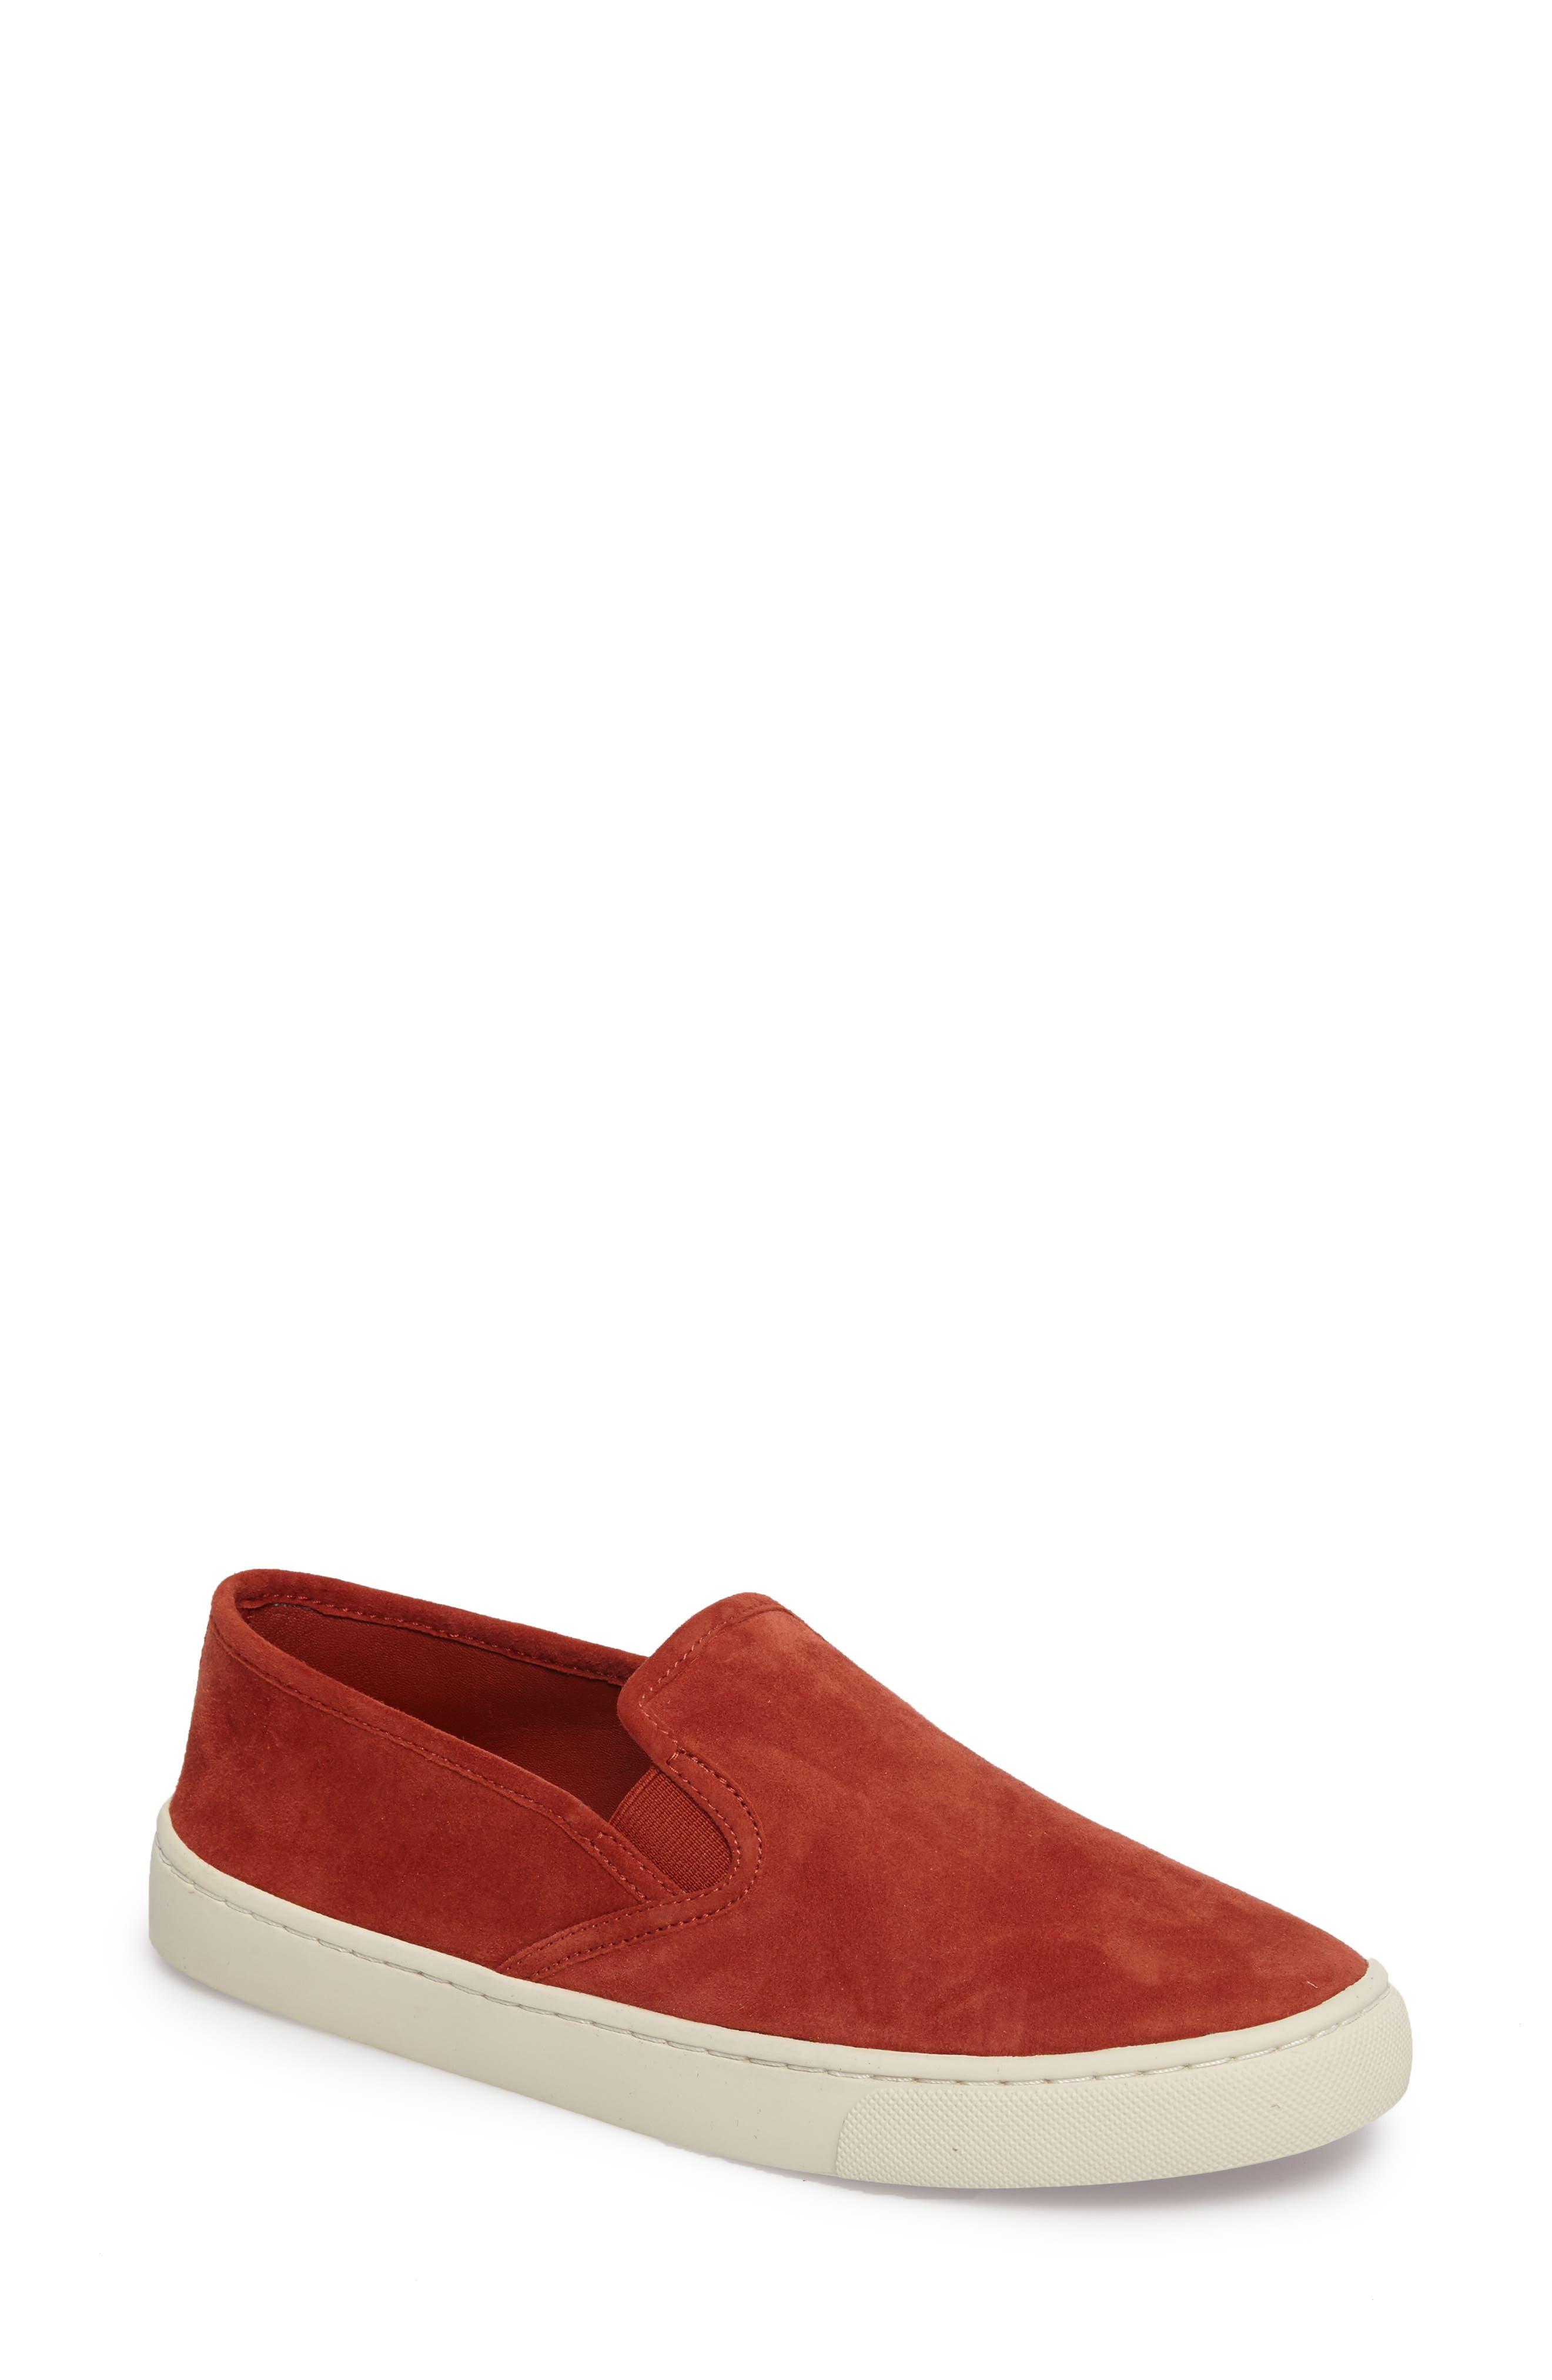 Max Slip-On Sneaker,                             Main thumbnail 5, color,